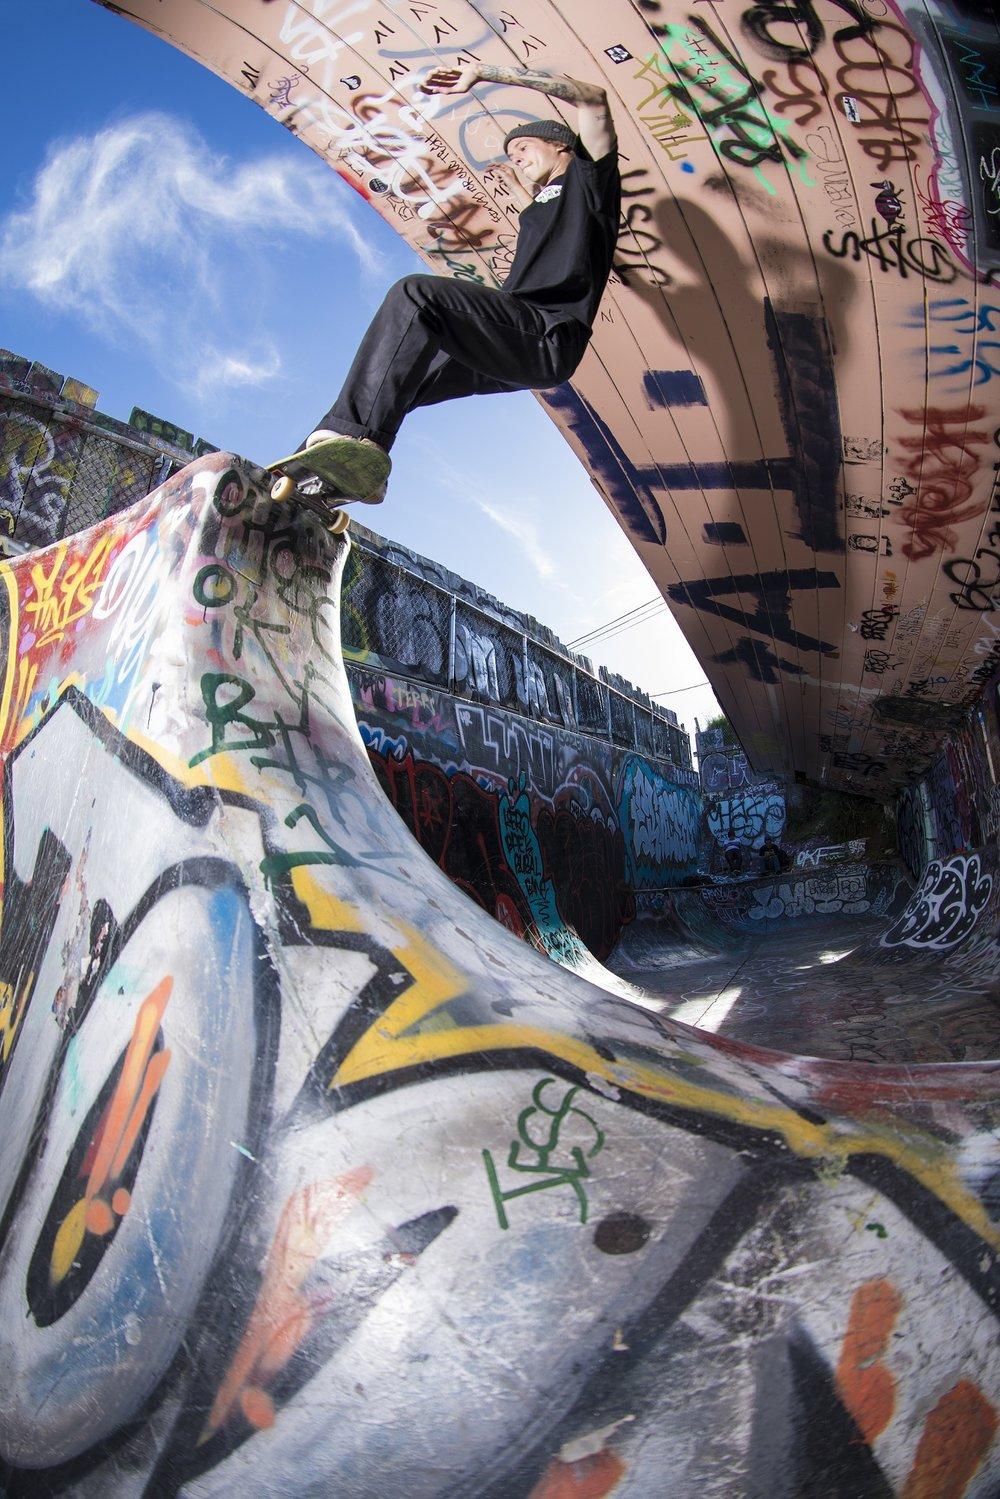 Phillip McKenzie skate photos